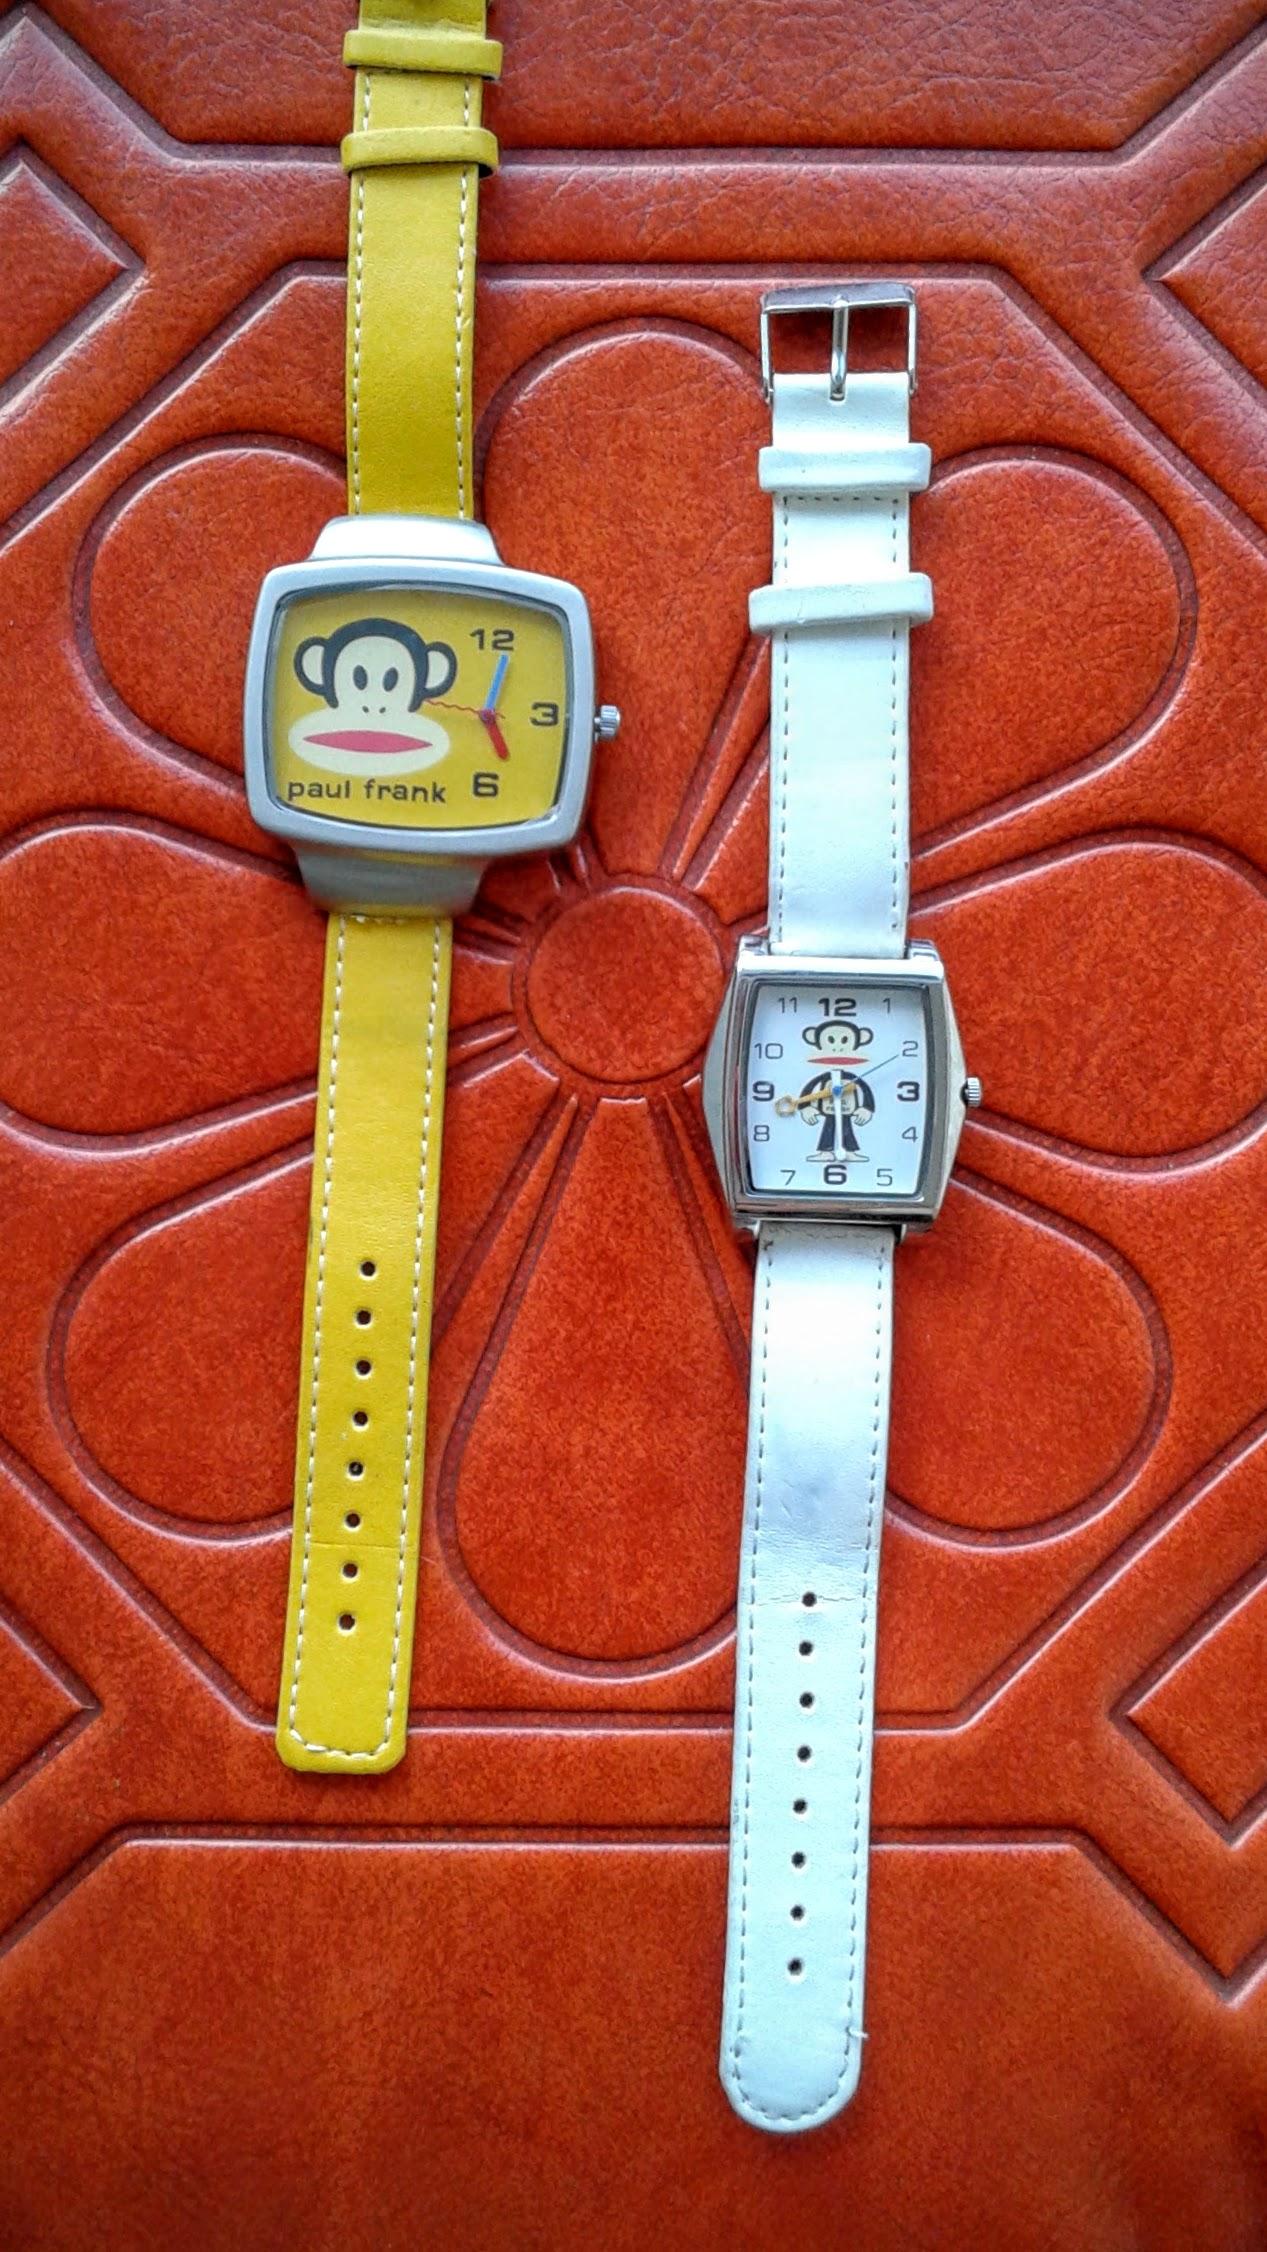 Paul Frank watches:Yellow, $28; White, $26